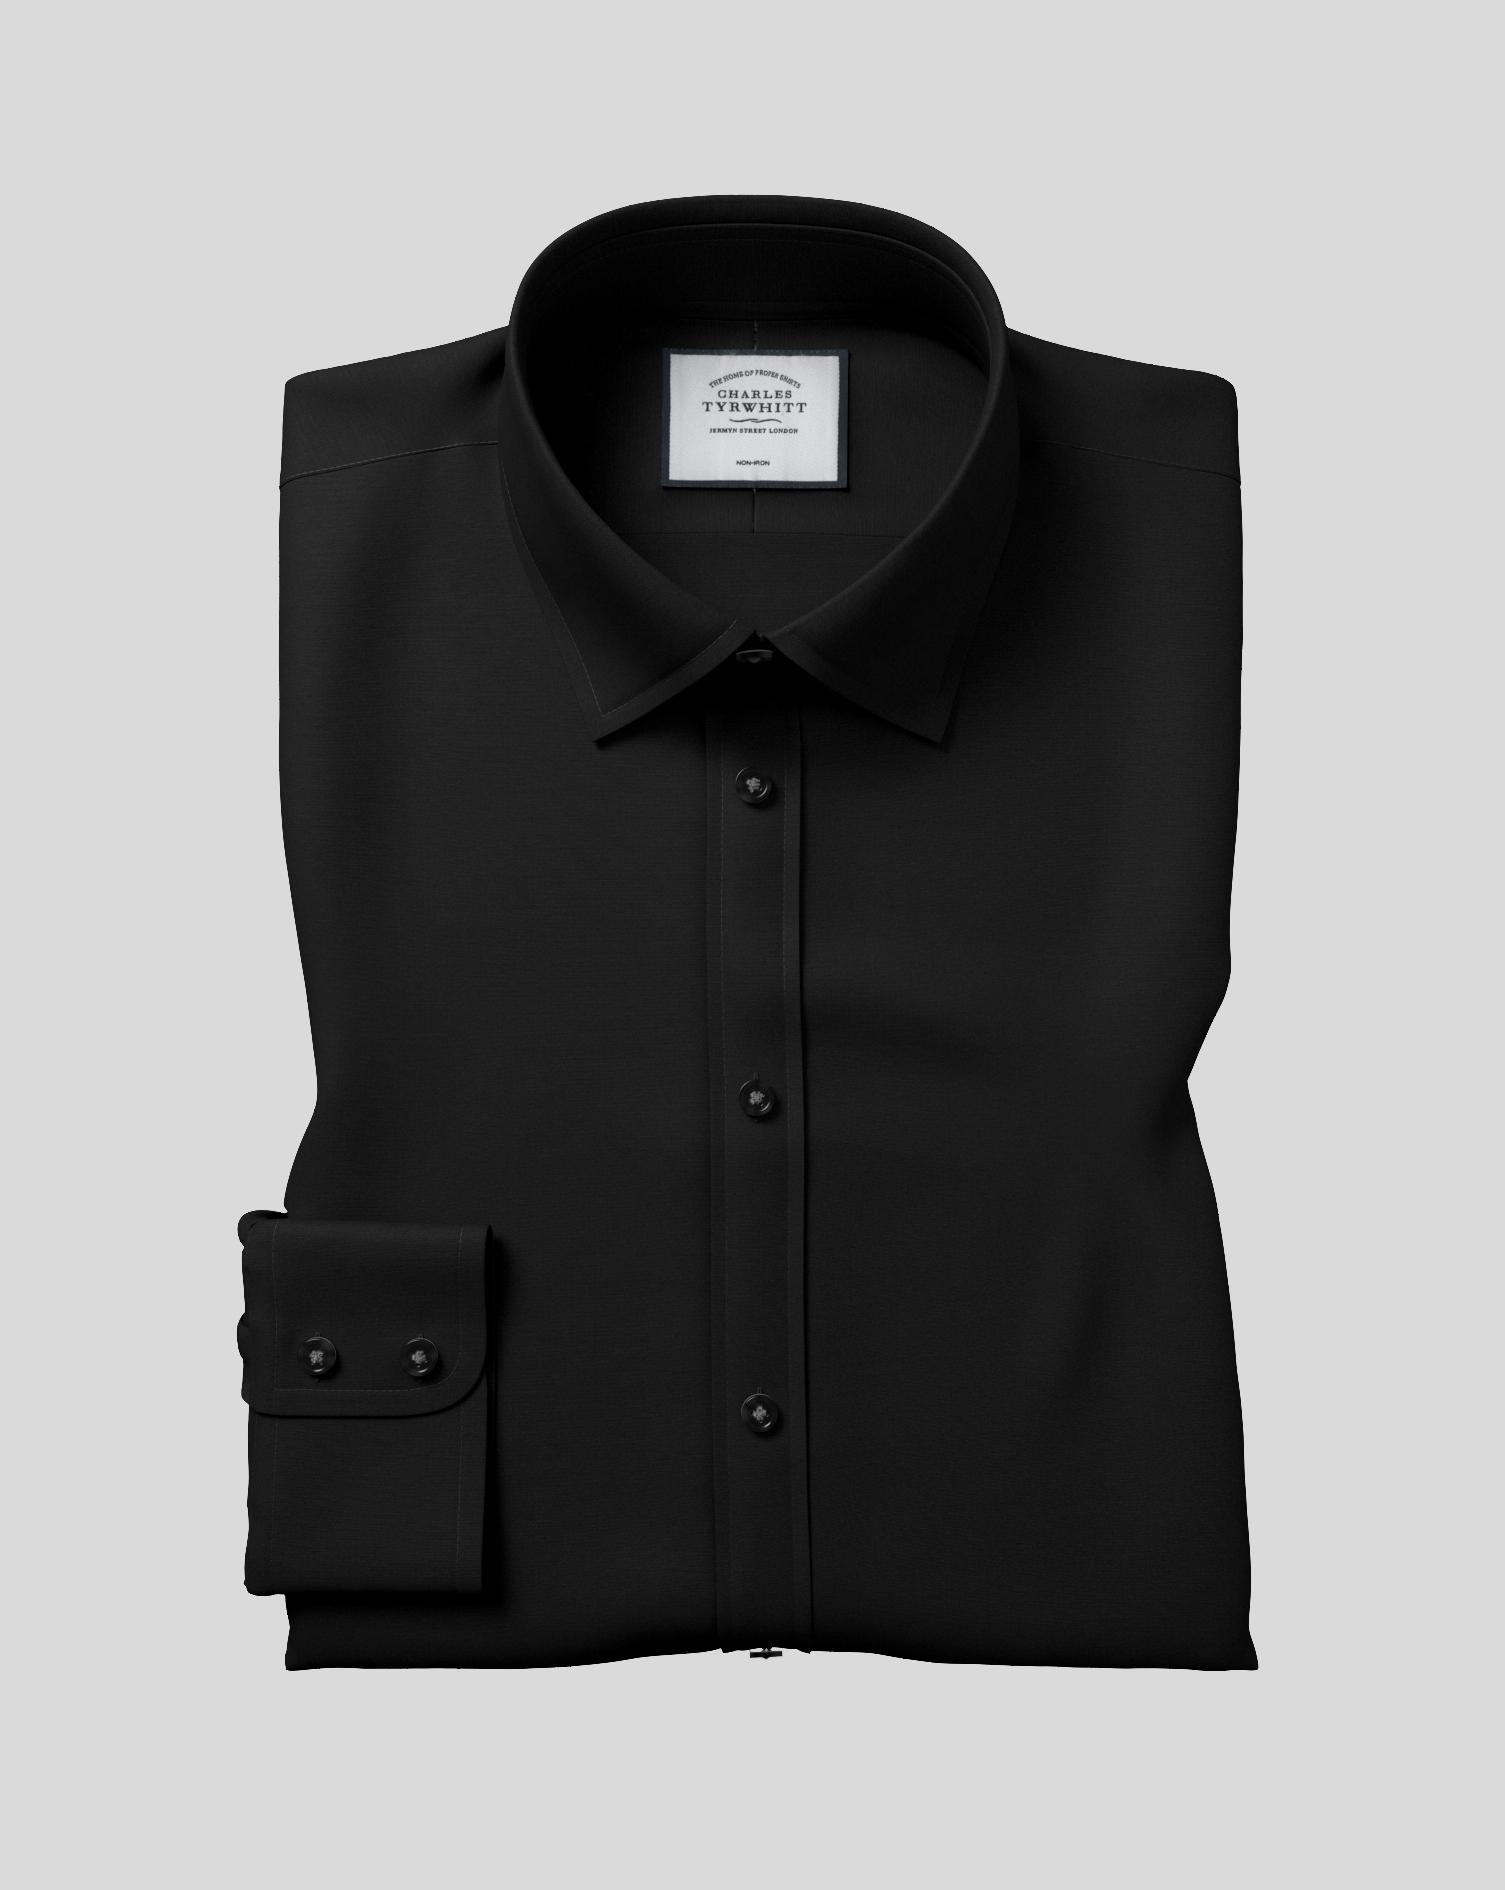 Cotton Classic Fit Black Non-Iron Poplin Shirt